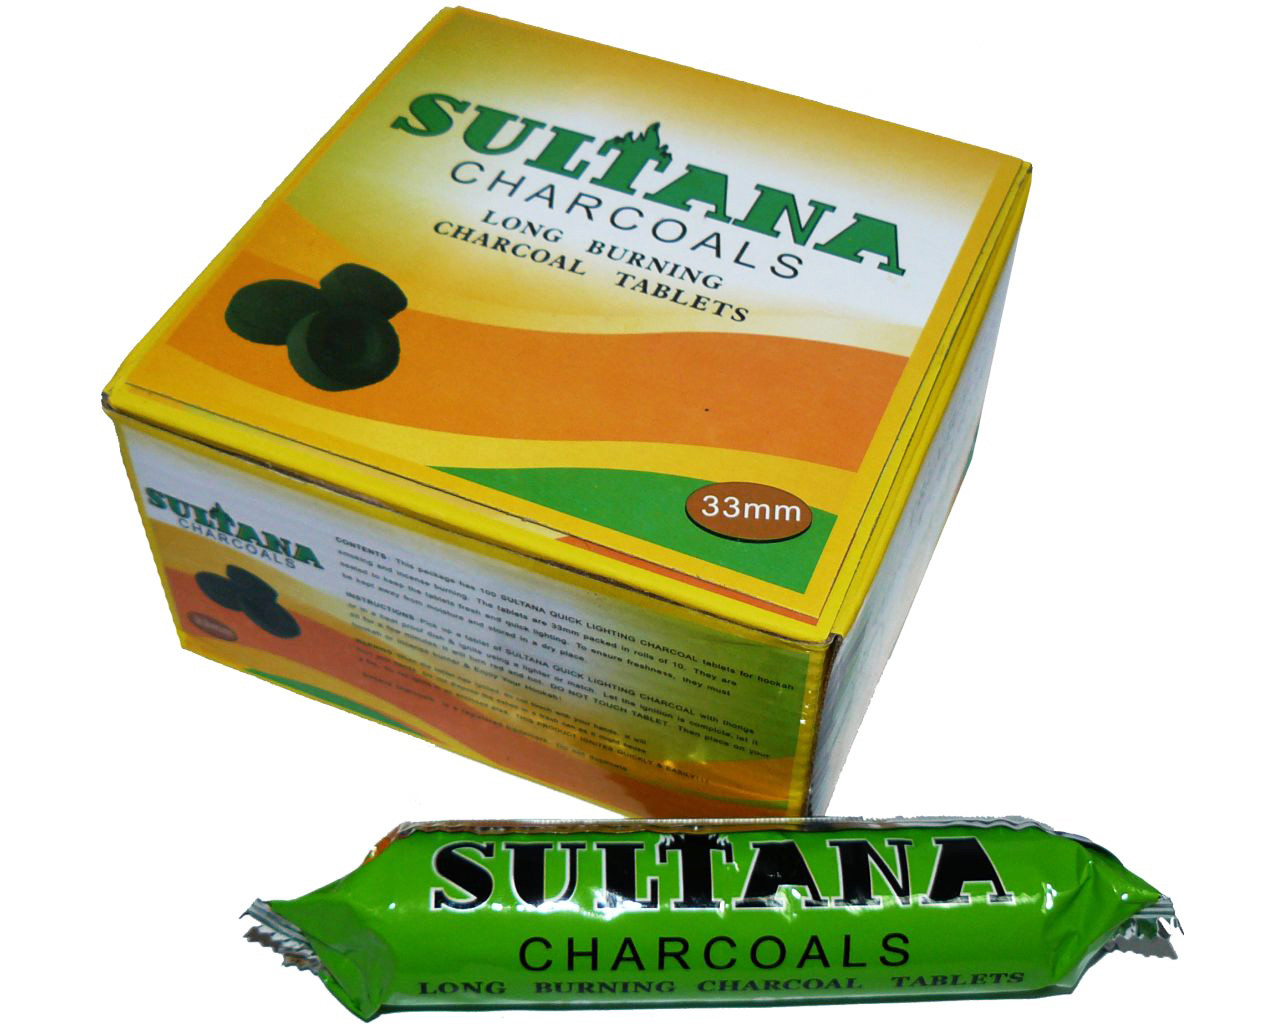 Уголь для кальяна Sultana диаметр 3,3 см (10 таблеток)